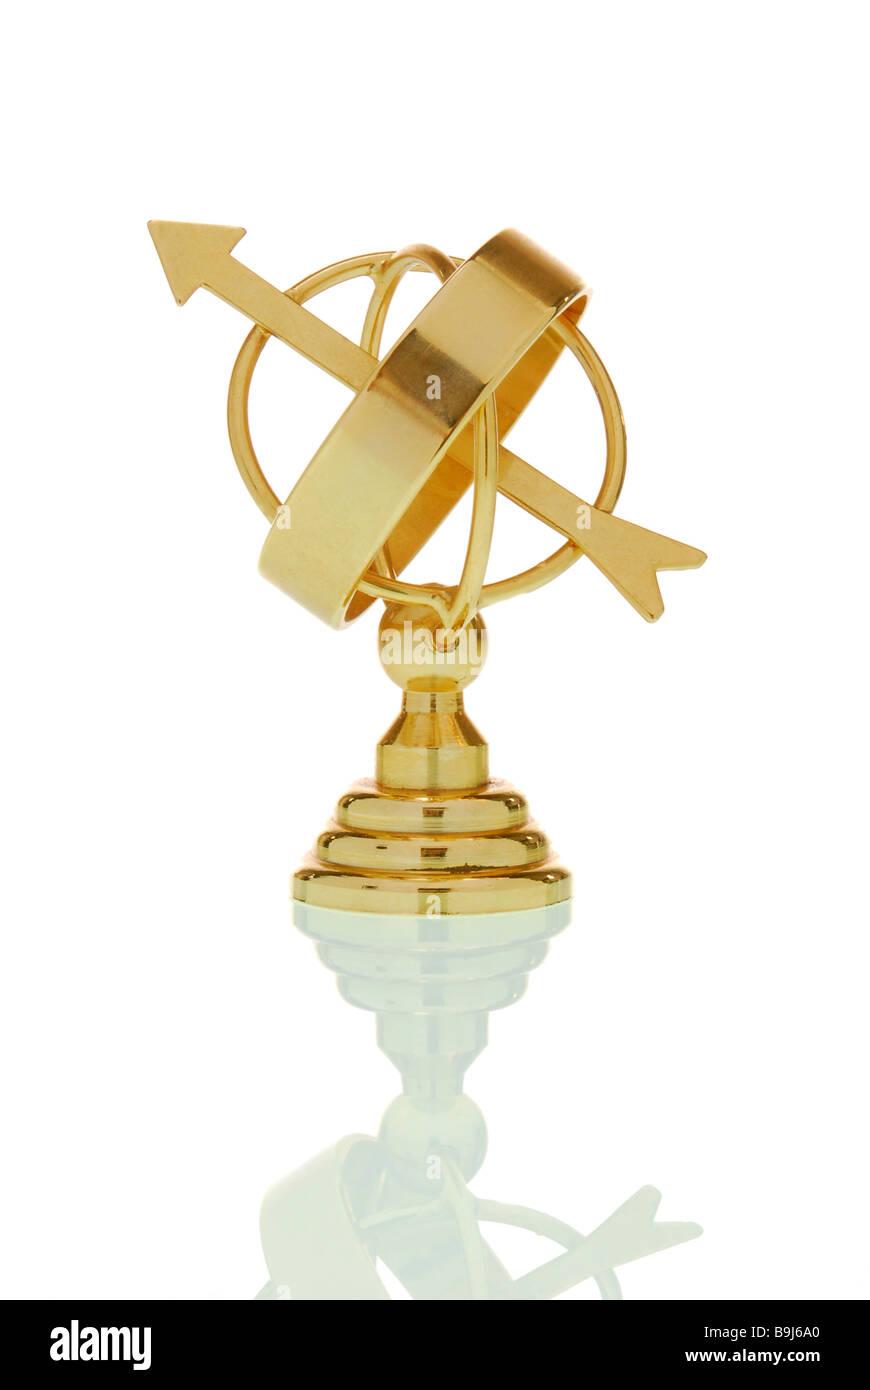 North Cape globe, symbolic of orientation - Stock Image